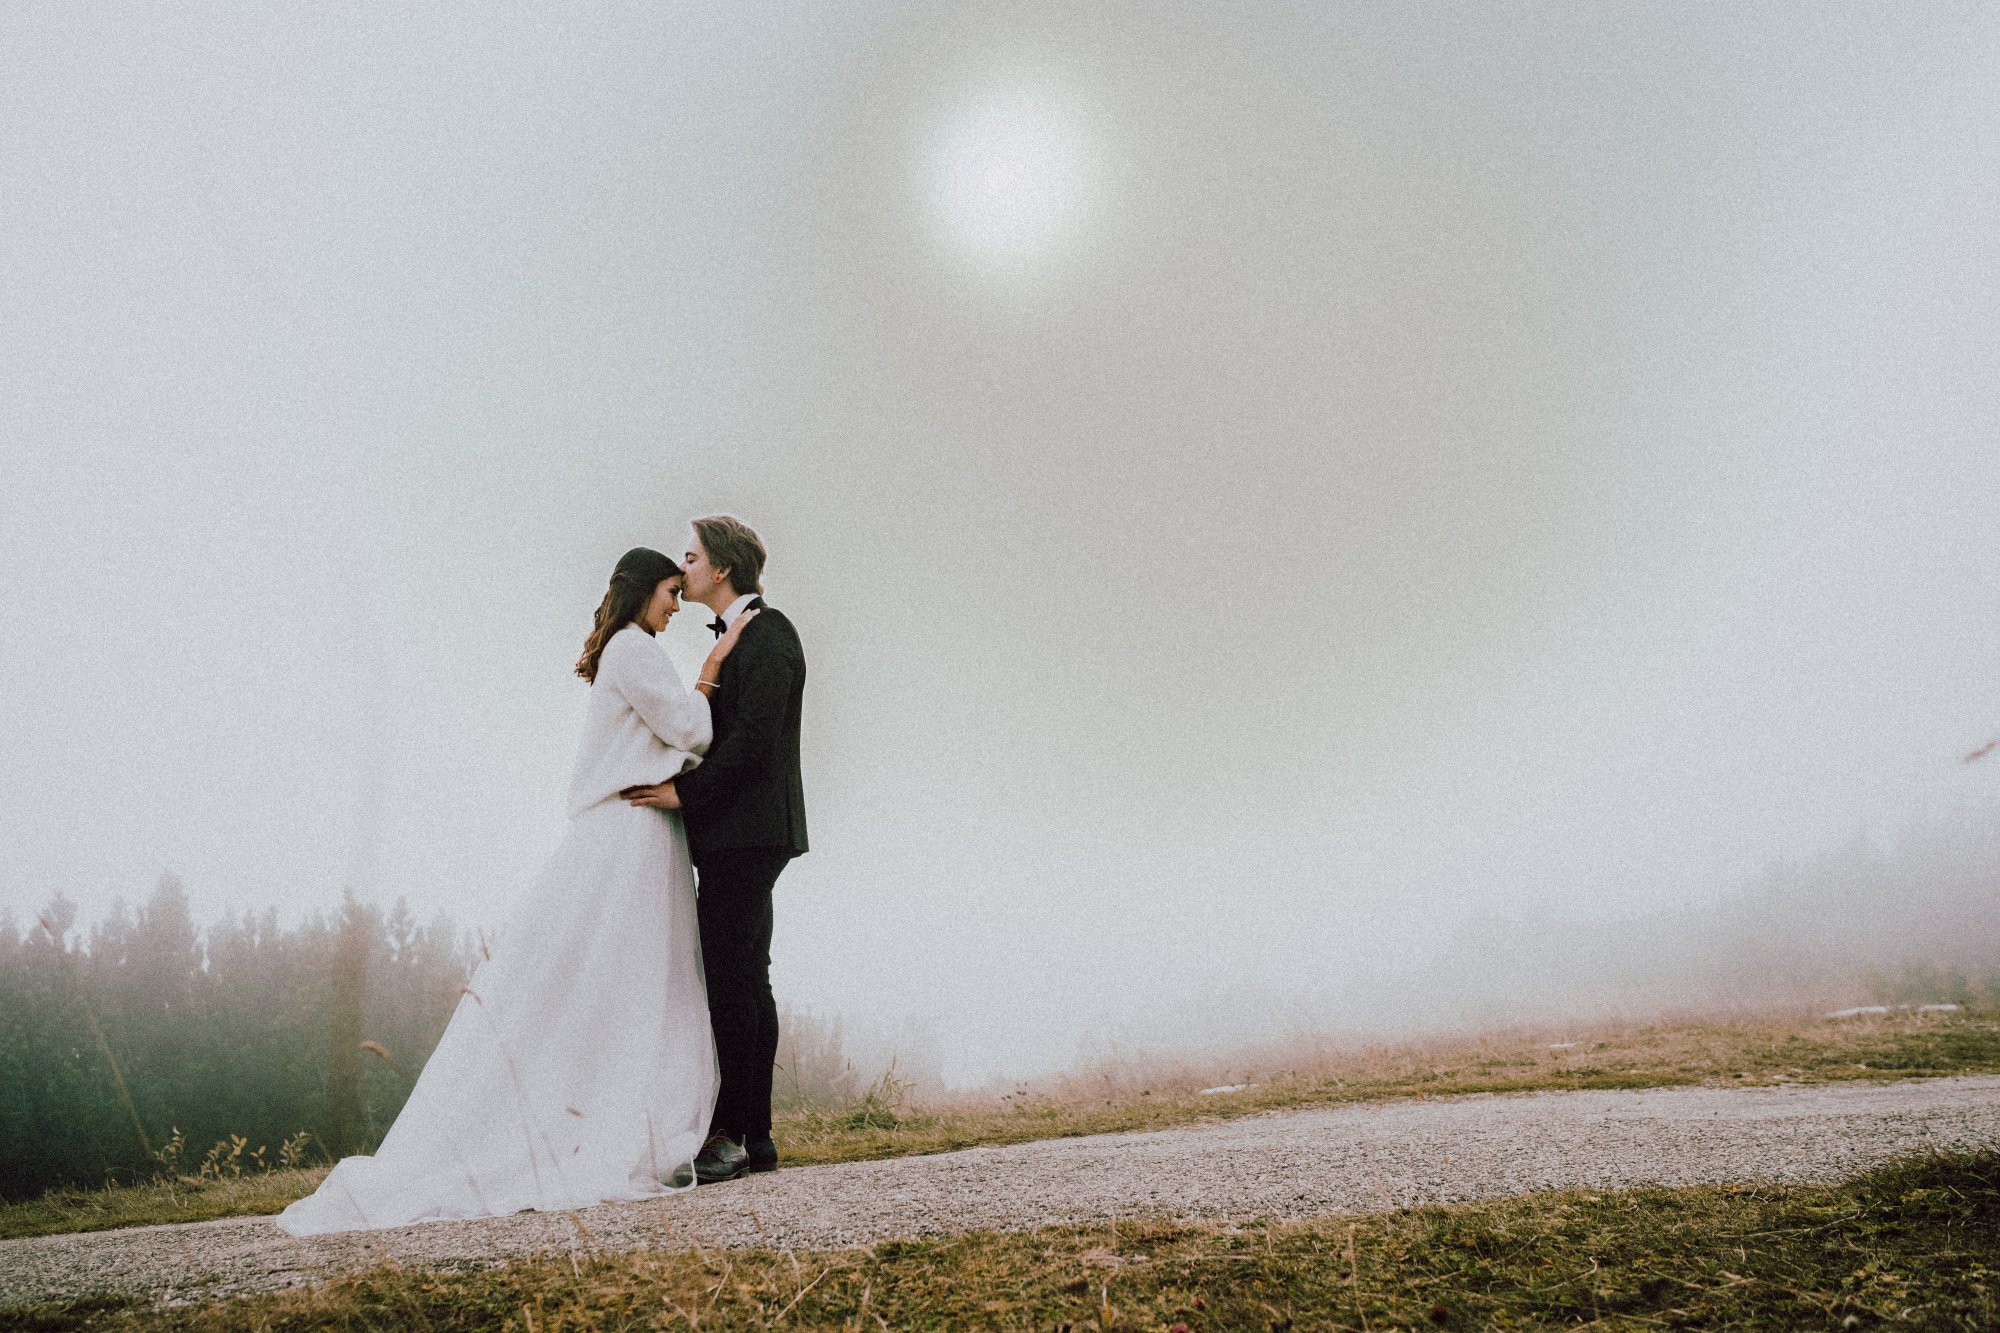 Wedding Planner Austria - Stressfree Weddings by SandraM